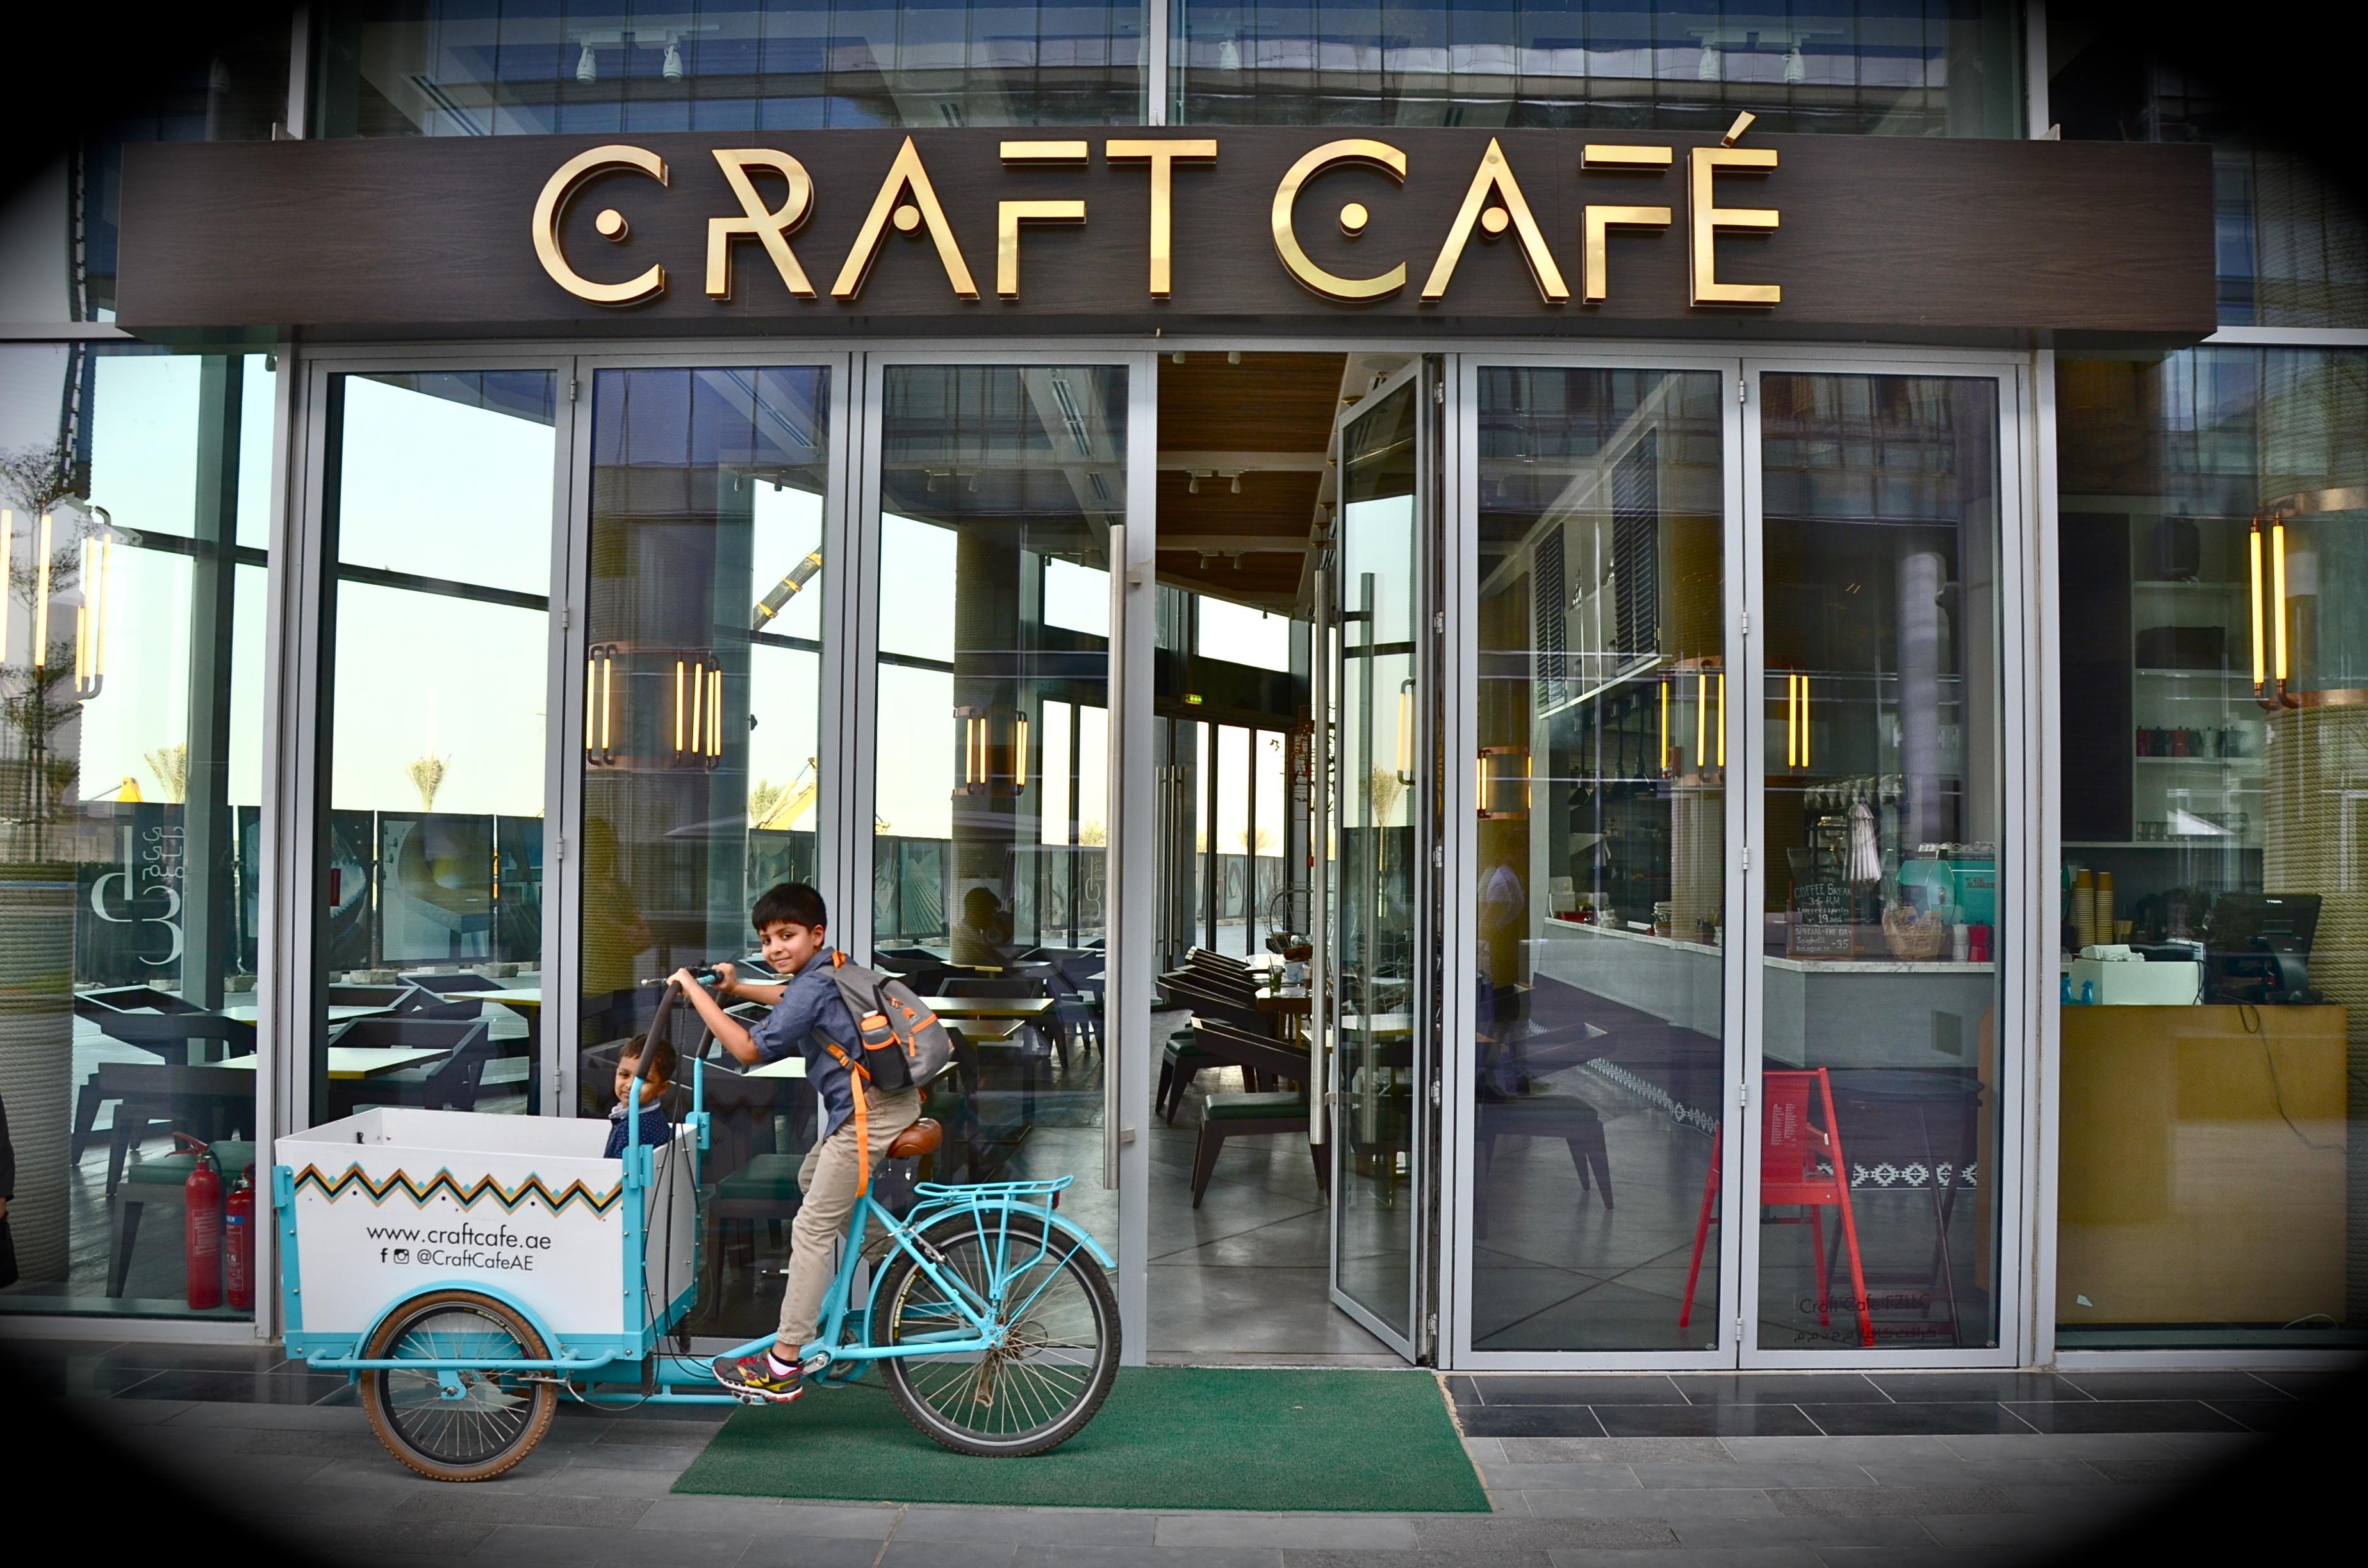 Entrance to craft cafe at dubai design district for Hotel dubai design district